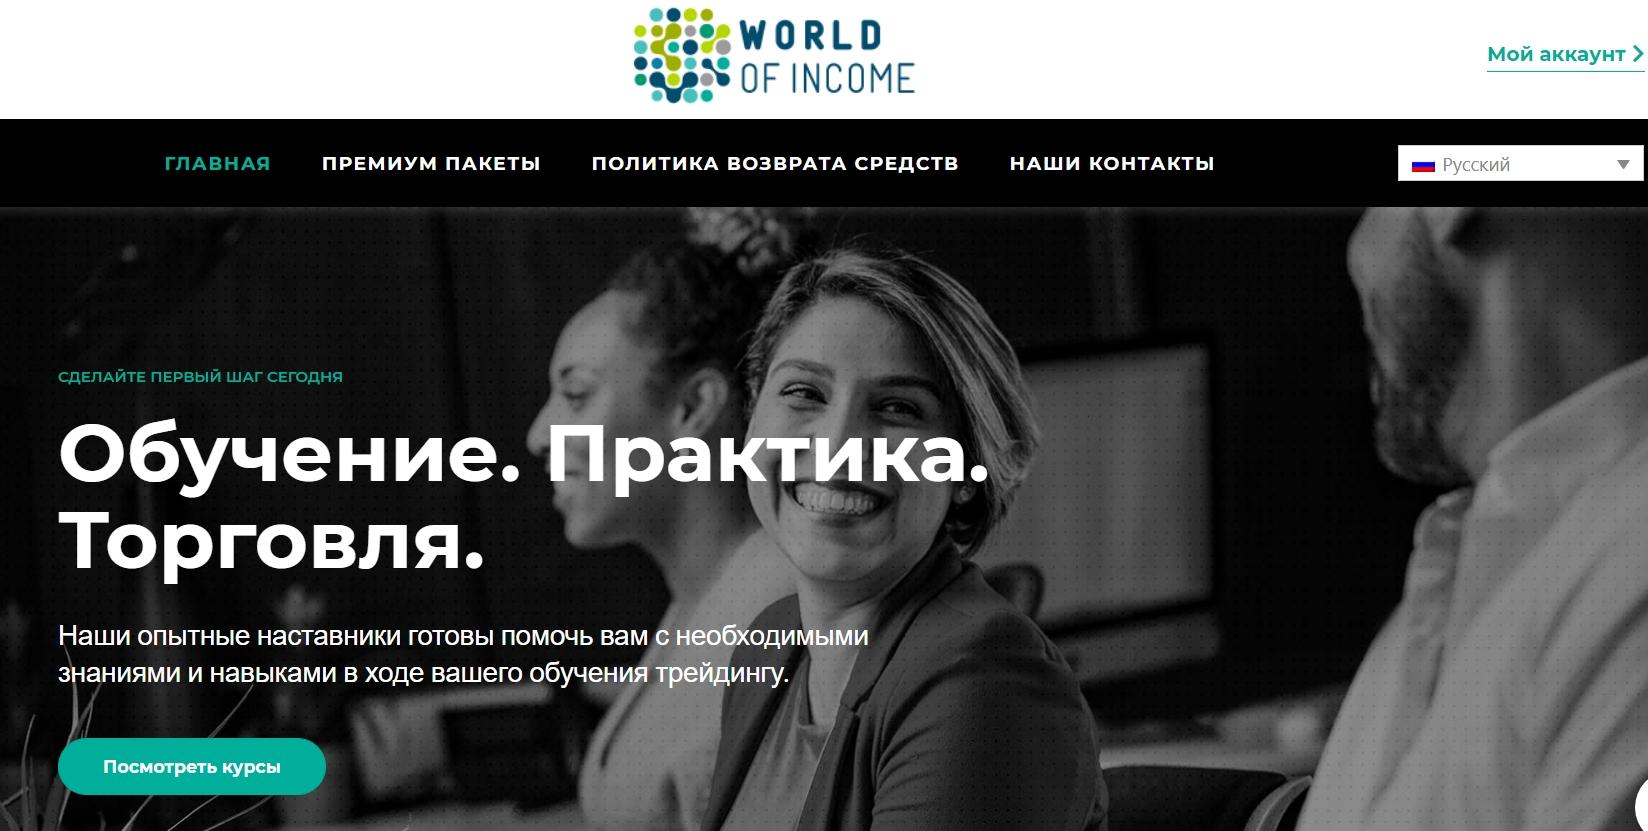 Официальный сайт Worldofincome.net